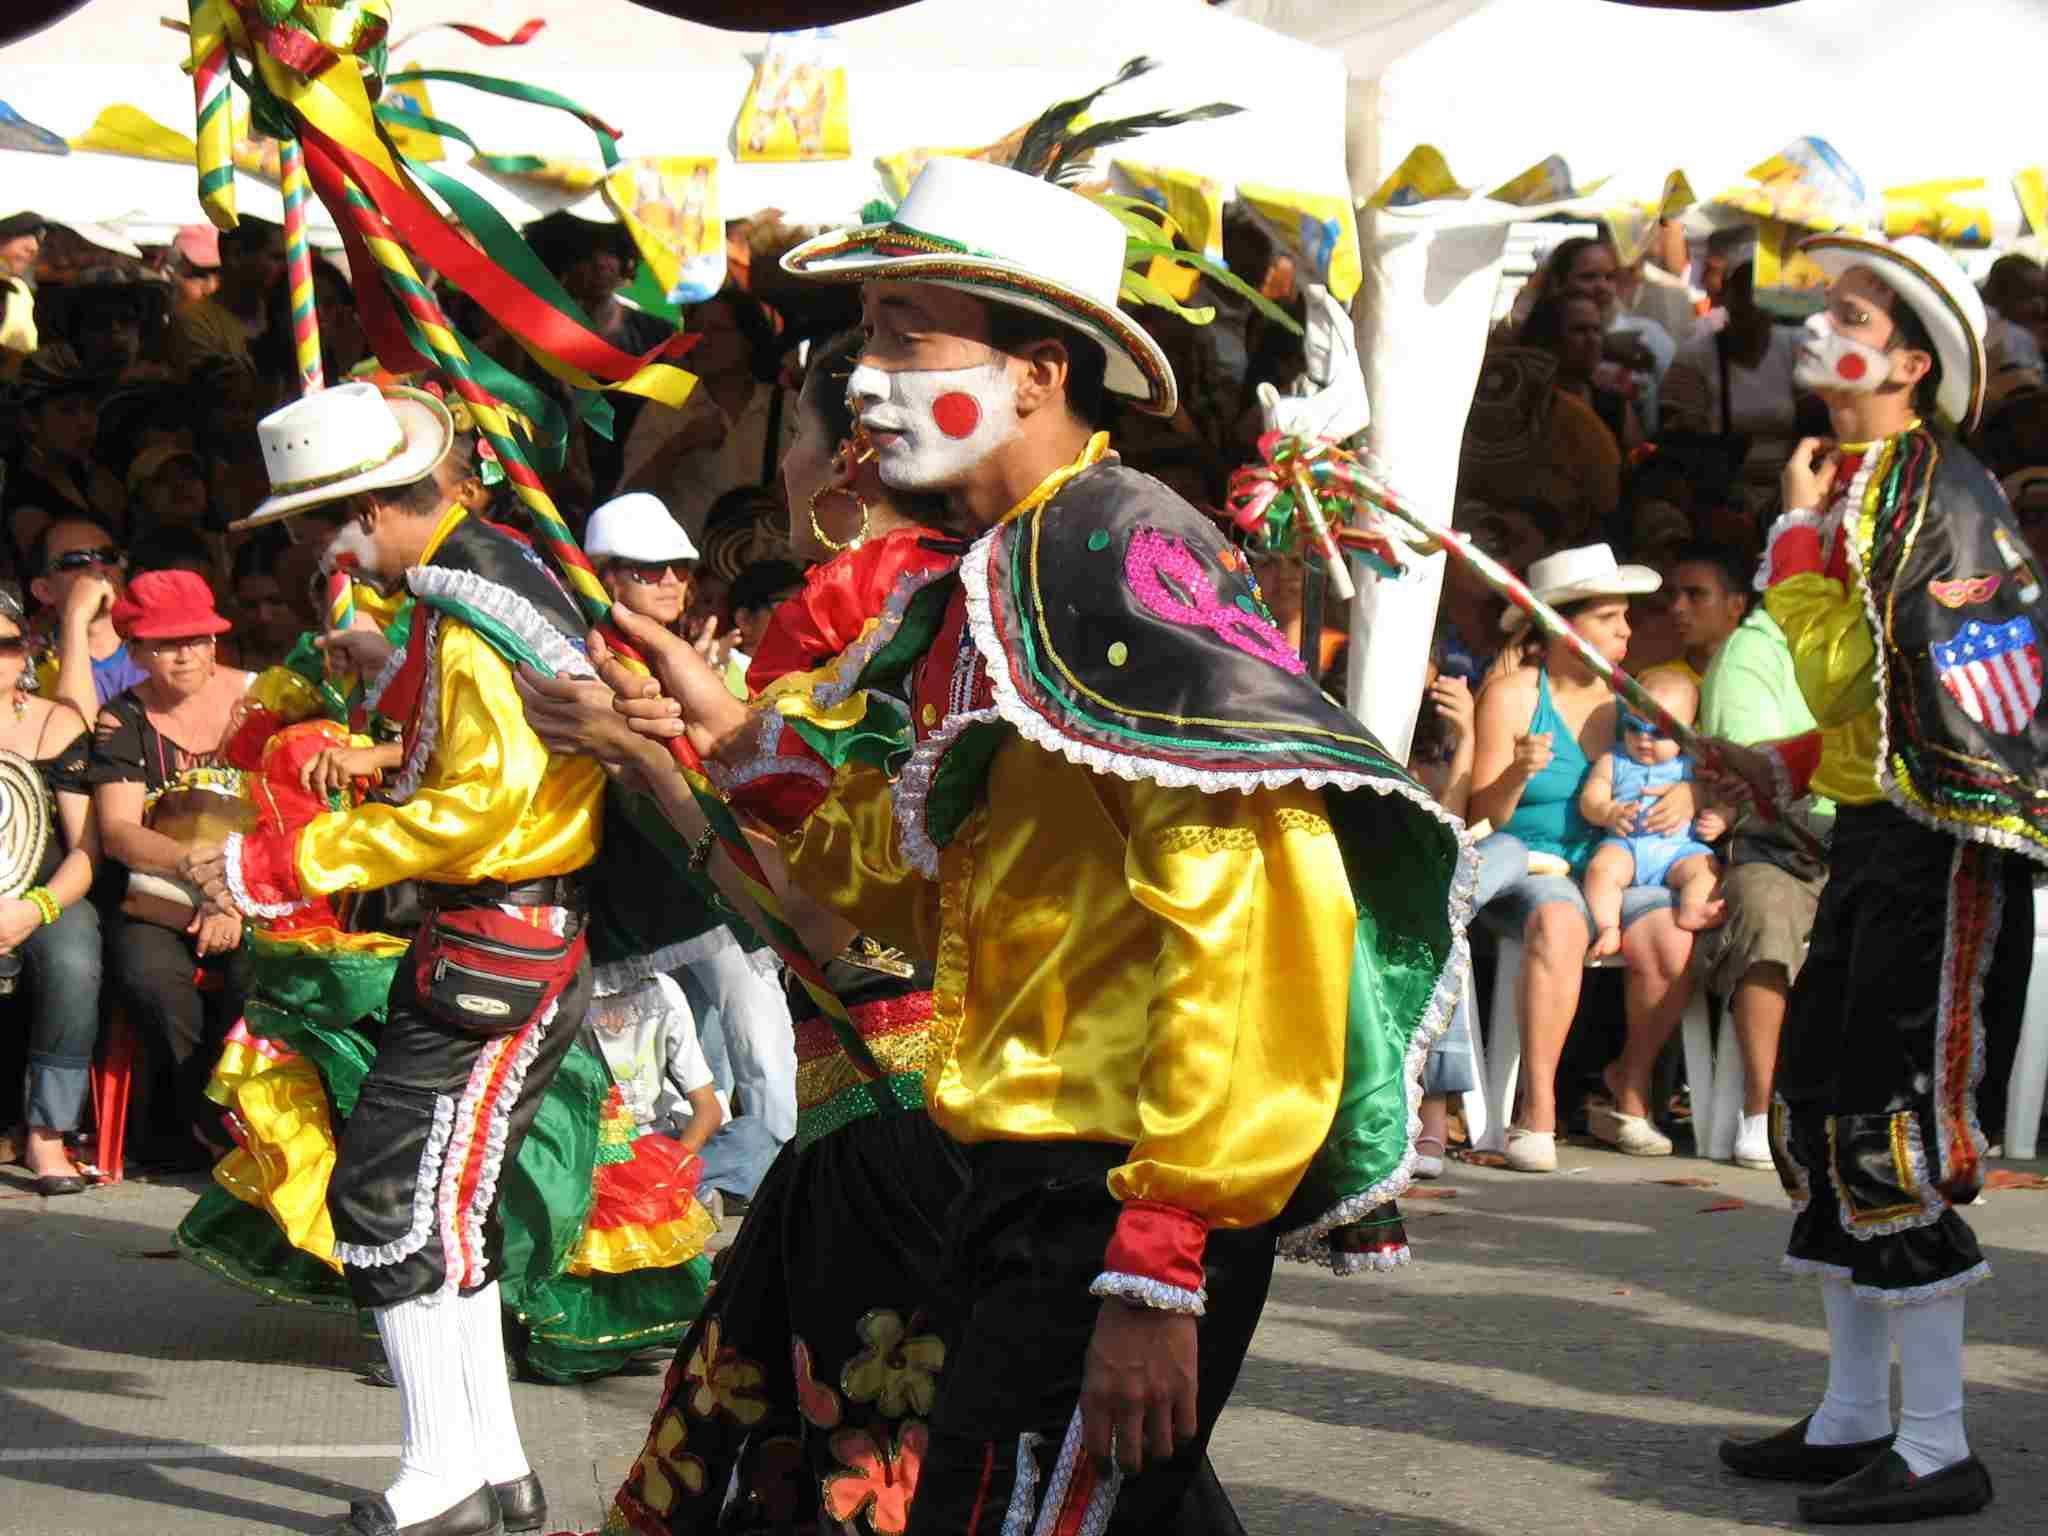 Garabato Carnaval de Barranquilla